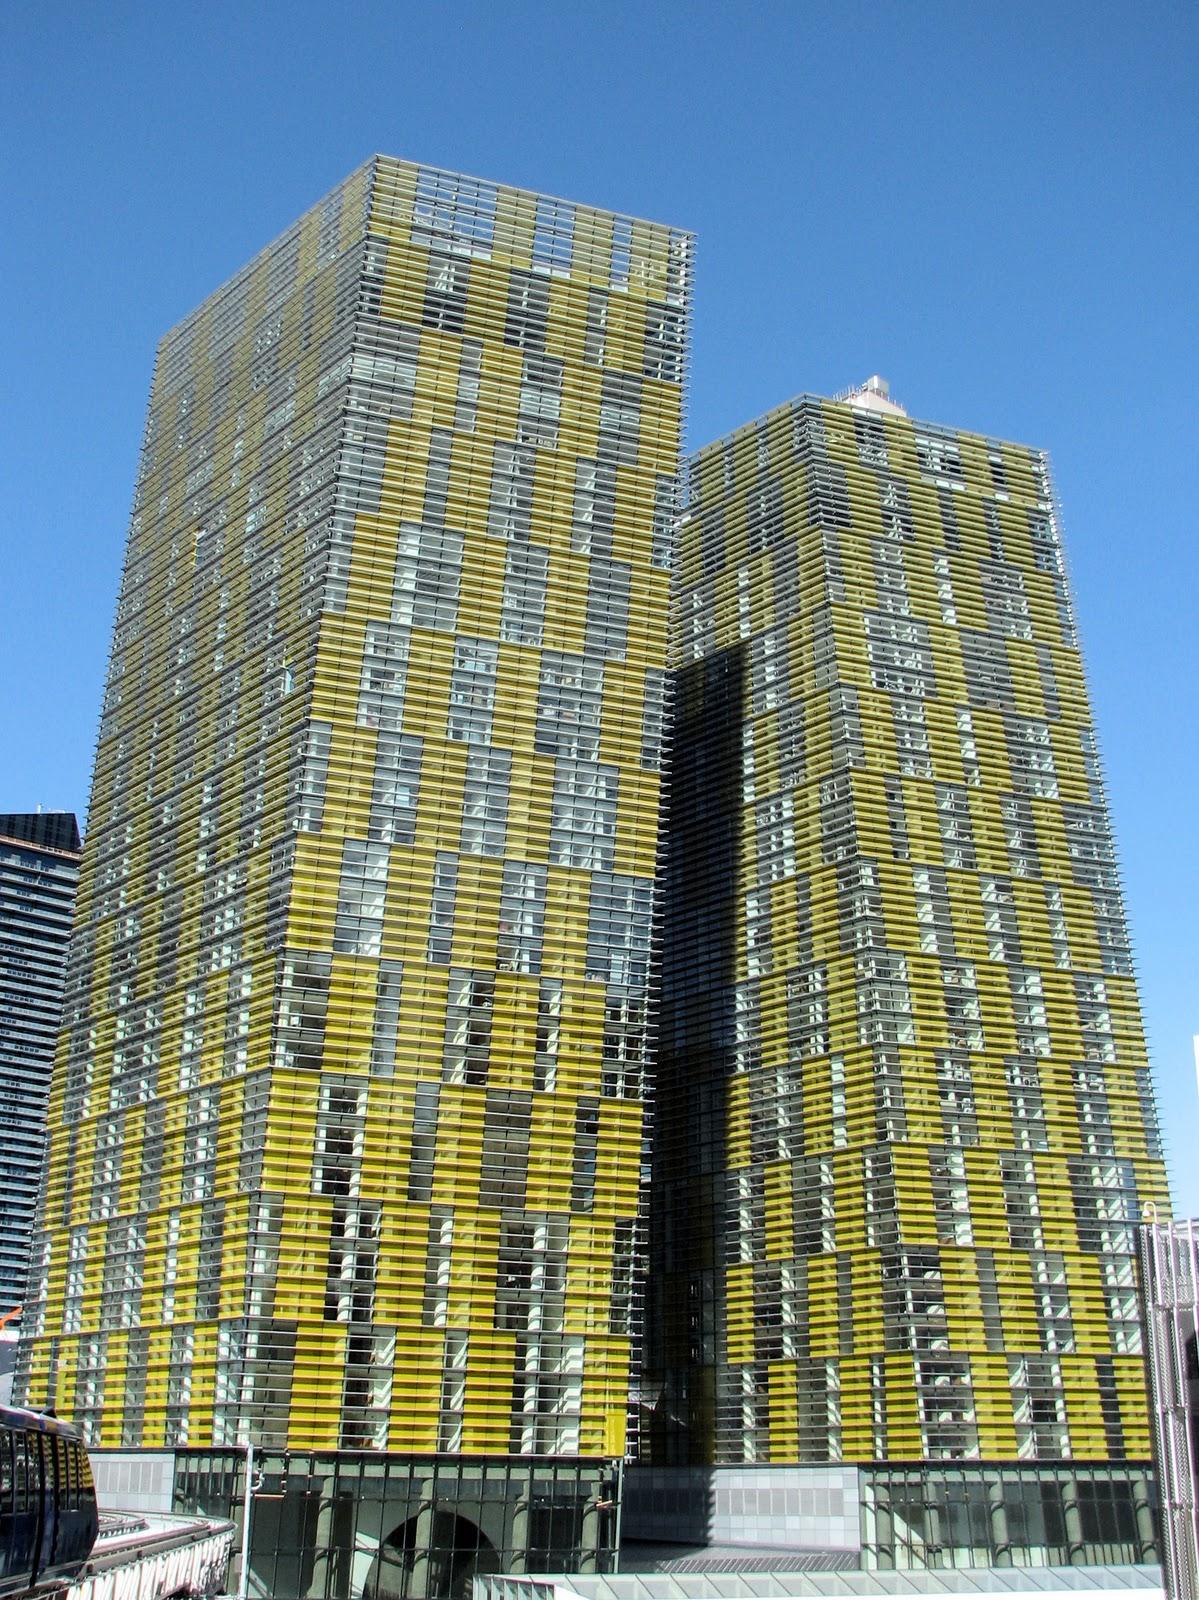 Veer Towers Floor Plan Three Bedroom Penthouse Vph 4: Ken's Photo Gallery: Veer Towers At City Center